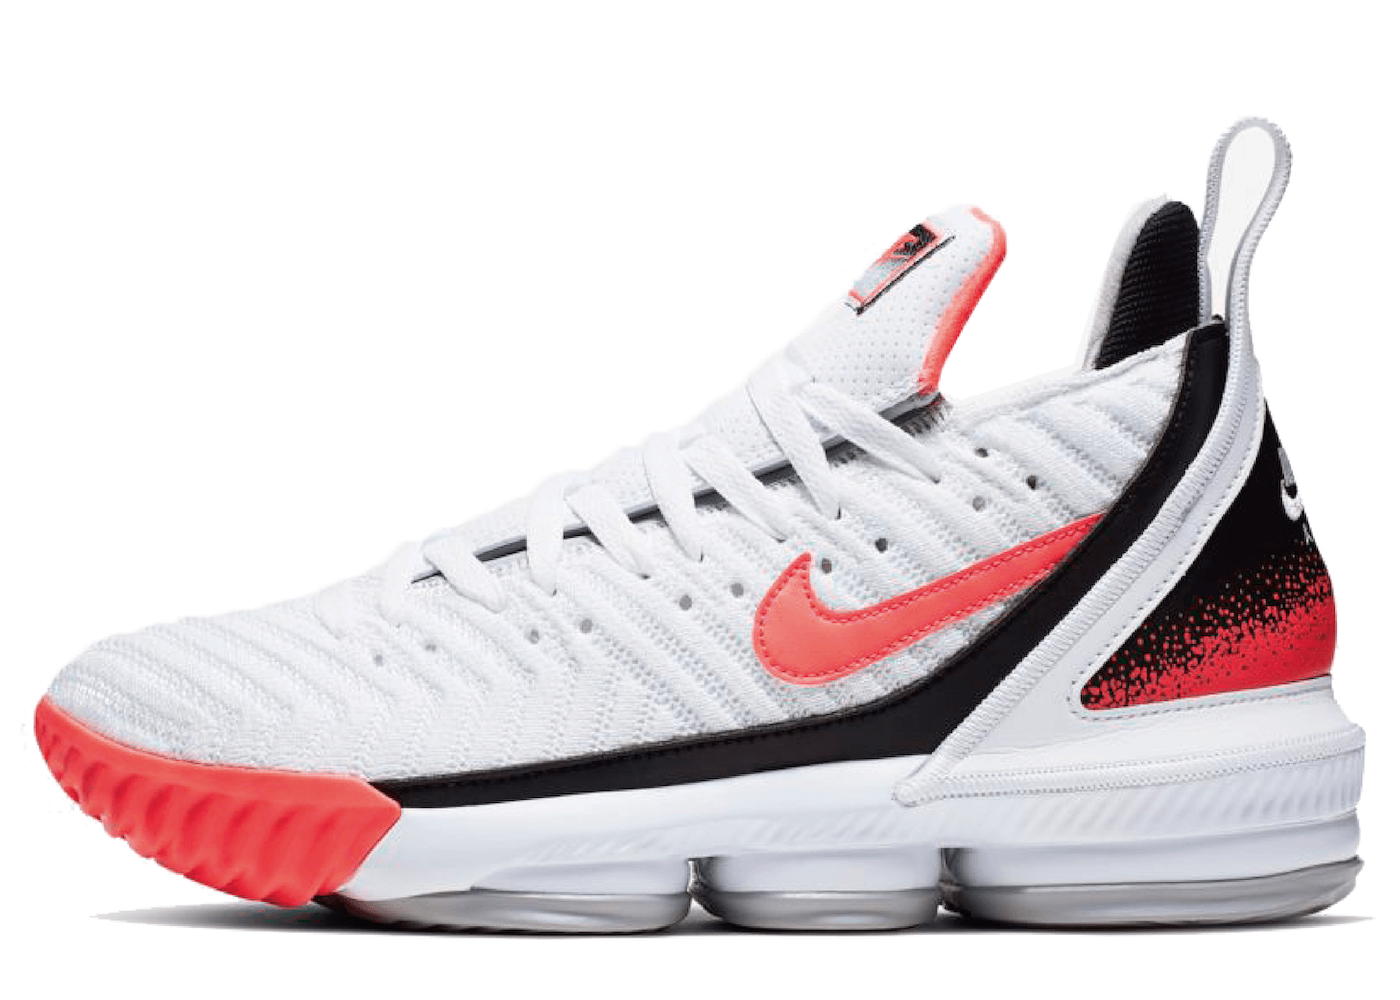 Nike LeBron 16 White Hot Lavaの写真